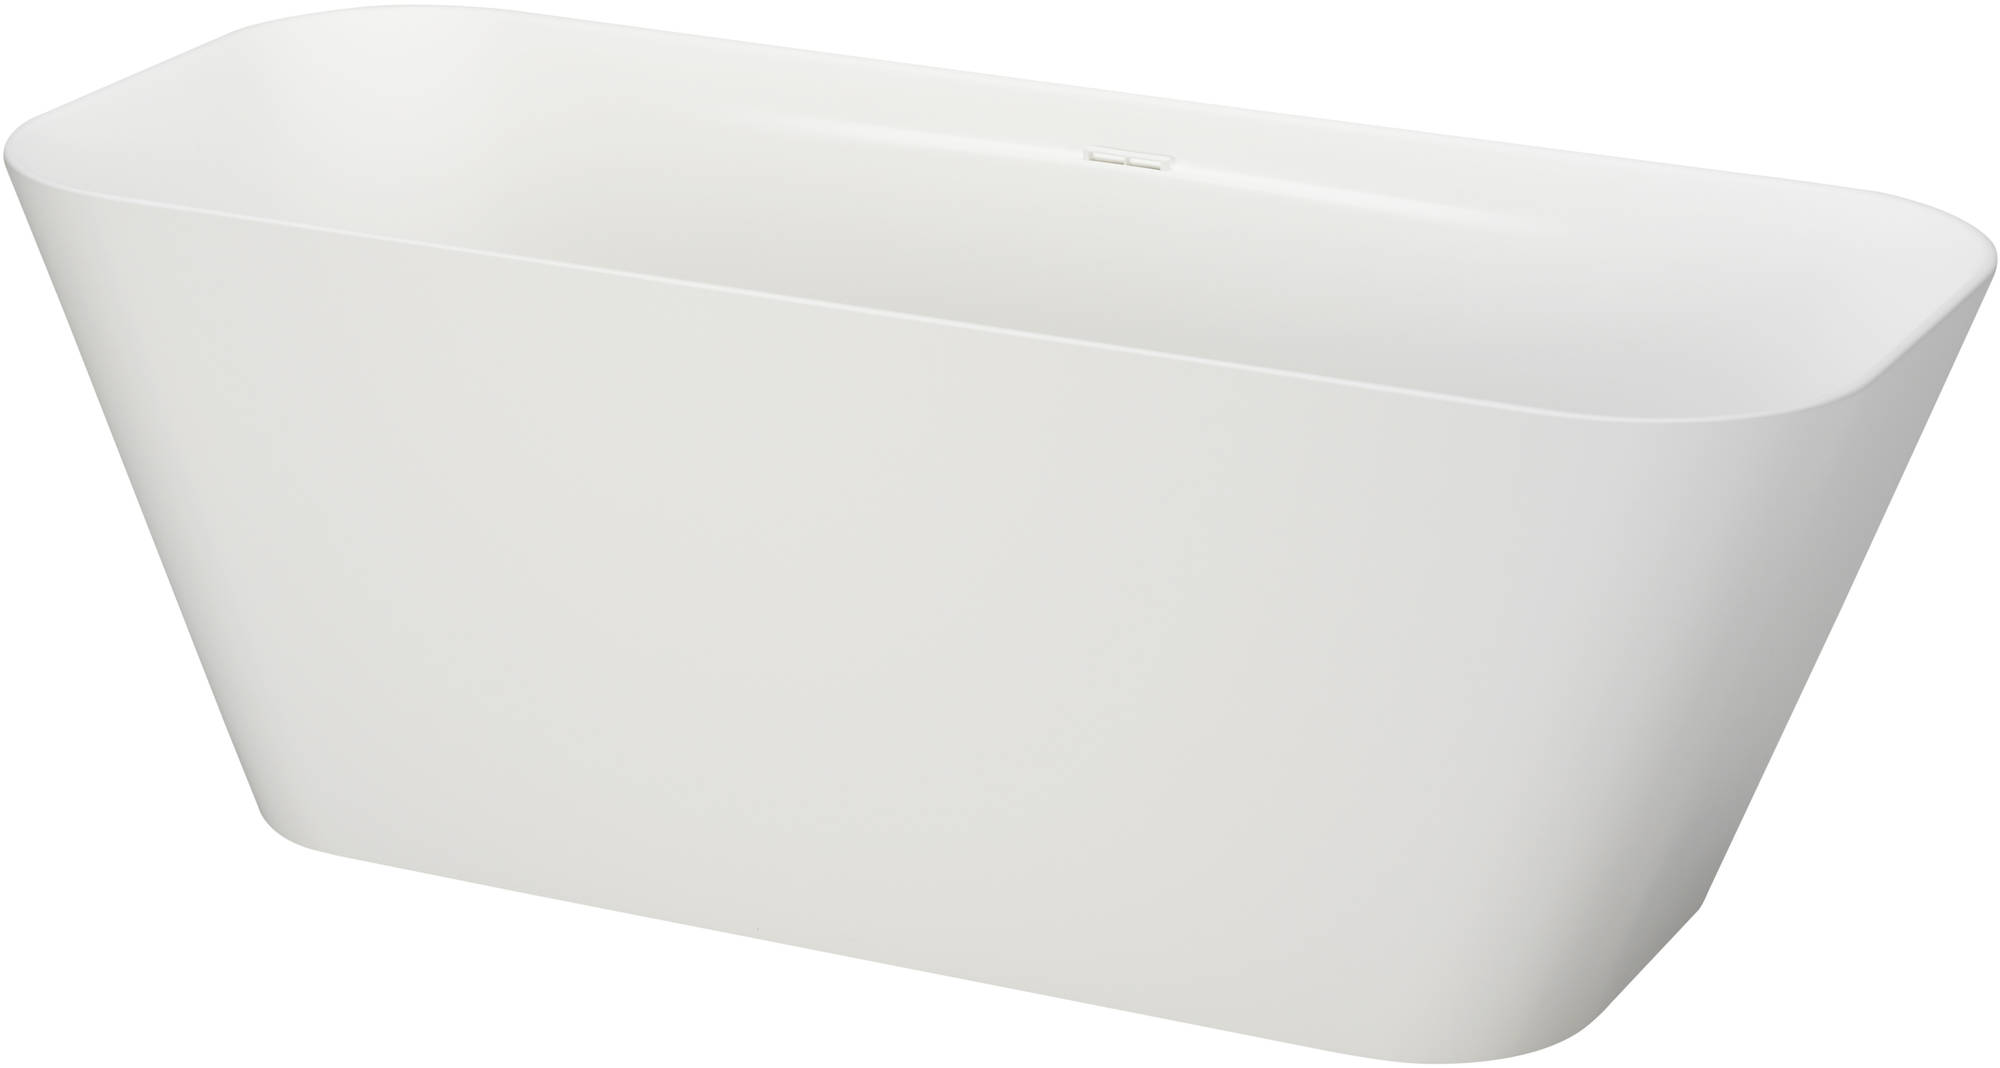 Ben Calp vrijstaand bad 170x70 cm Solid Surface Mat Wit